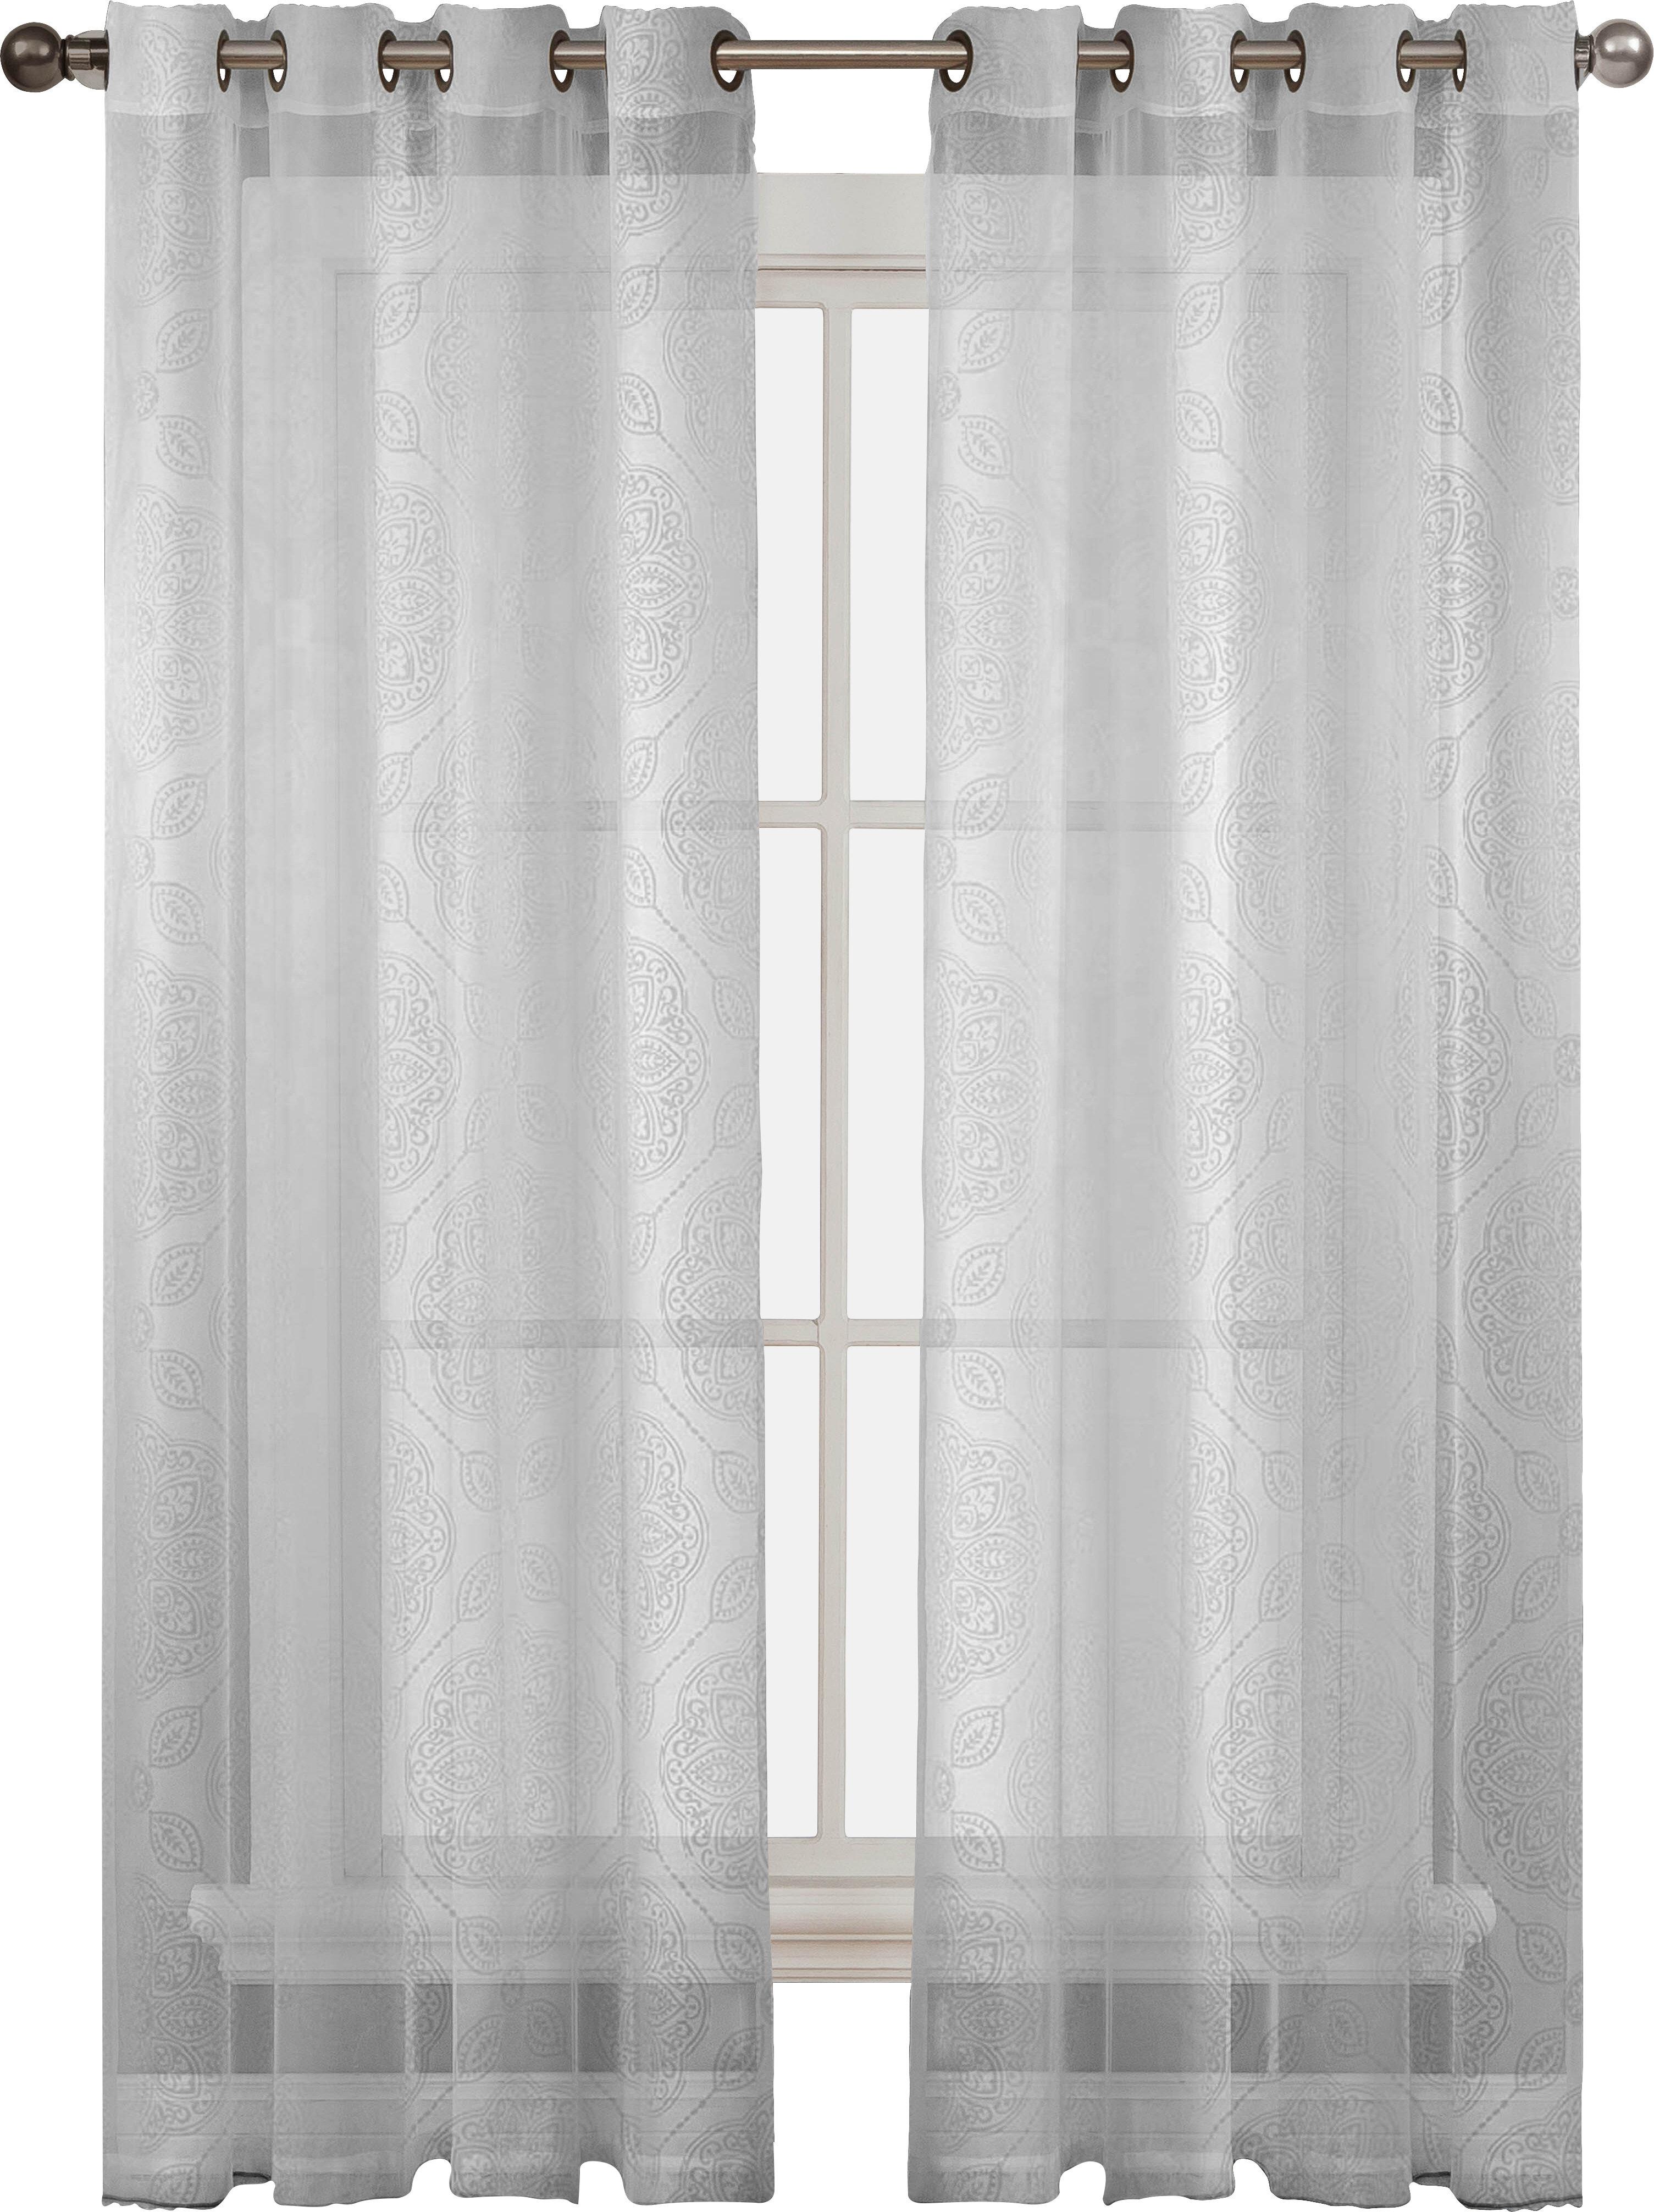 Window Elements Diamante Damask Sheer Grommet Curtain Panels ...